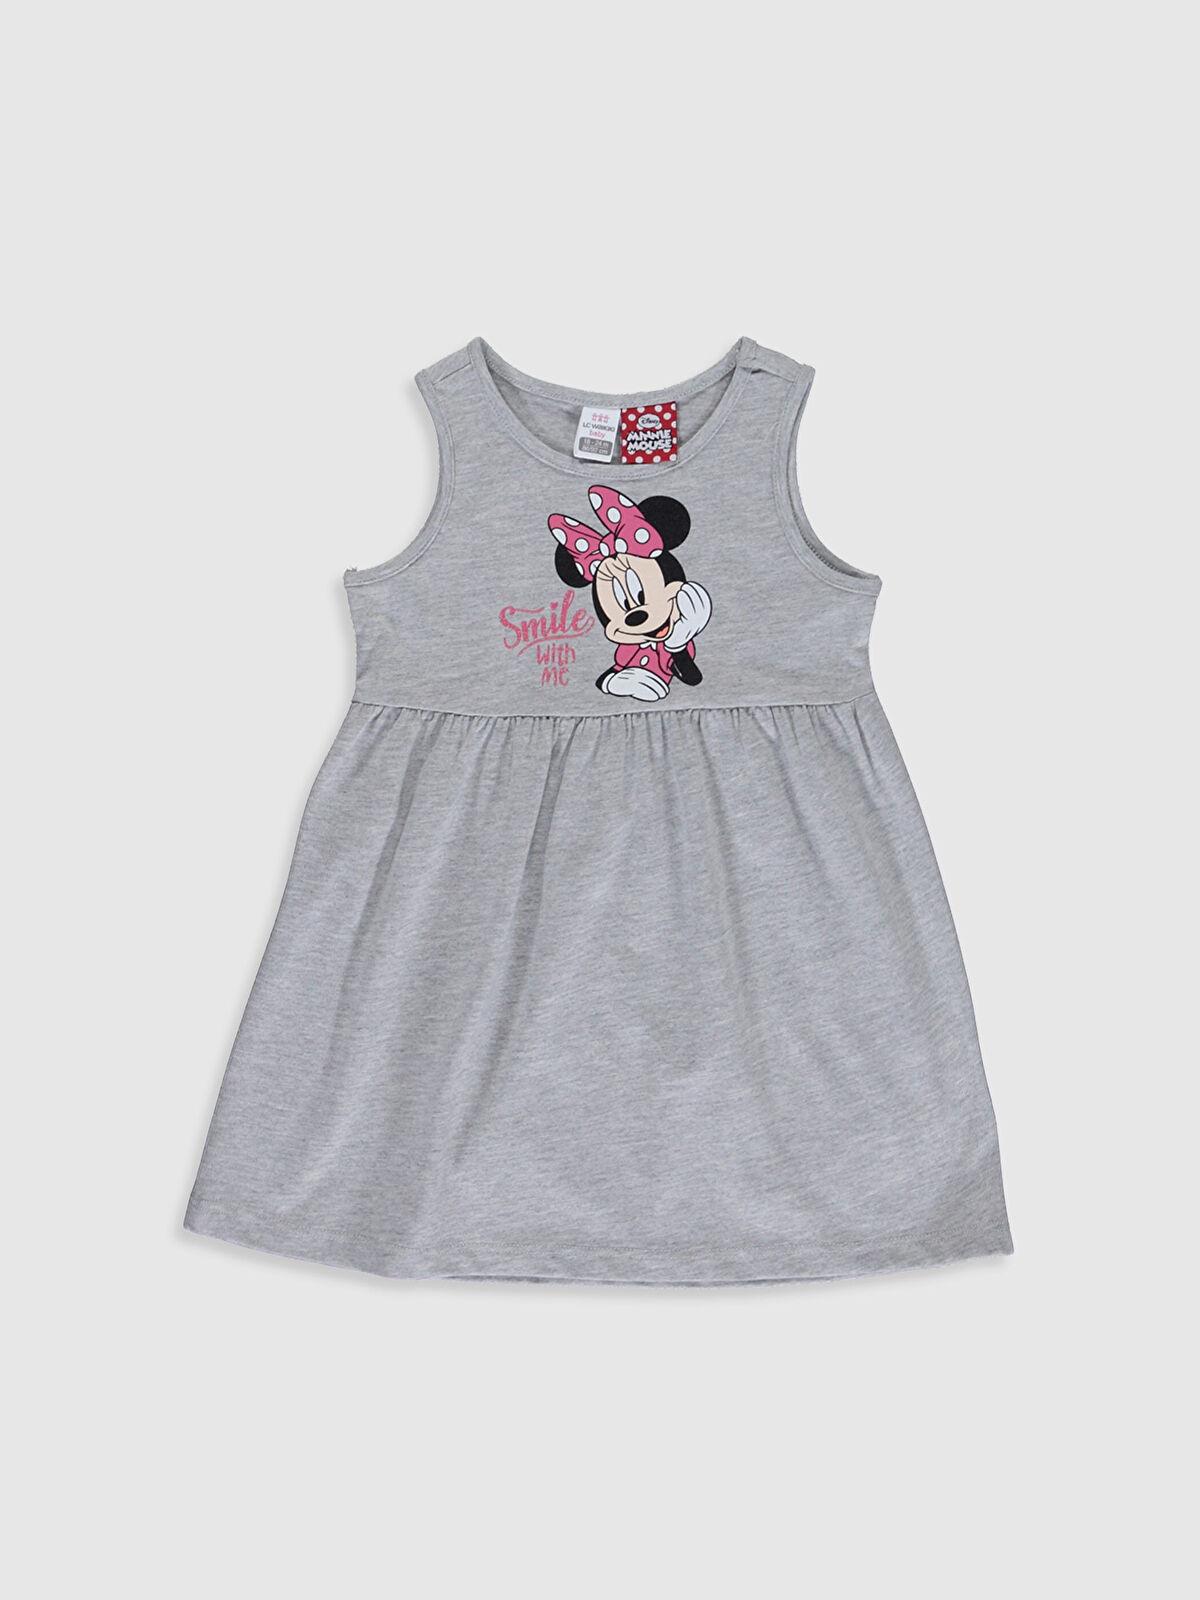 Kız Bebek Minnie Mouse Baskılı Elbise - LC WAIKIKI